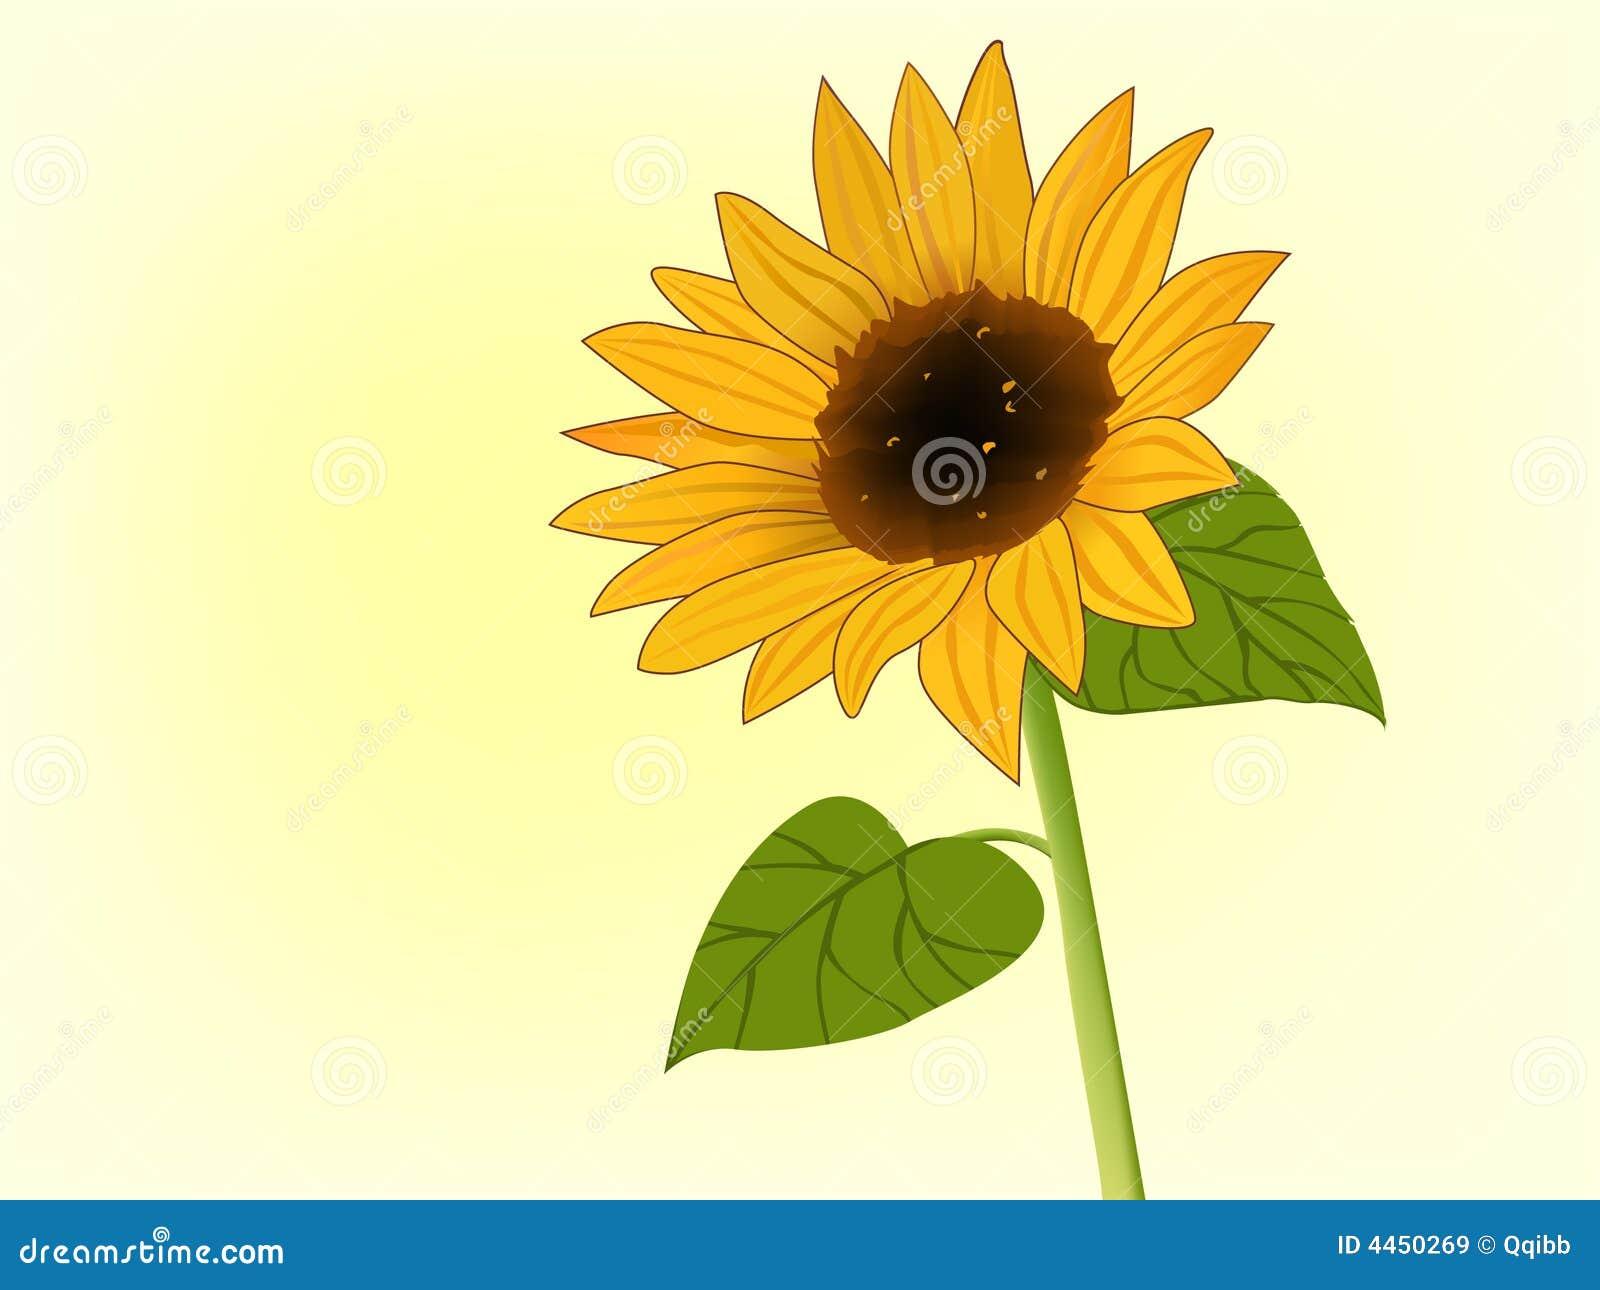 illustration de tournesol en fleur illustration de vecteur image 4450269. Black Bedroom Furniture Sets. Home Design Ideas